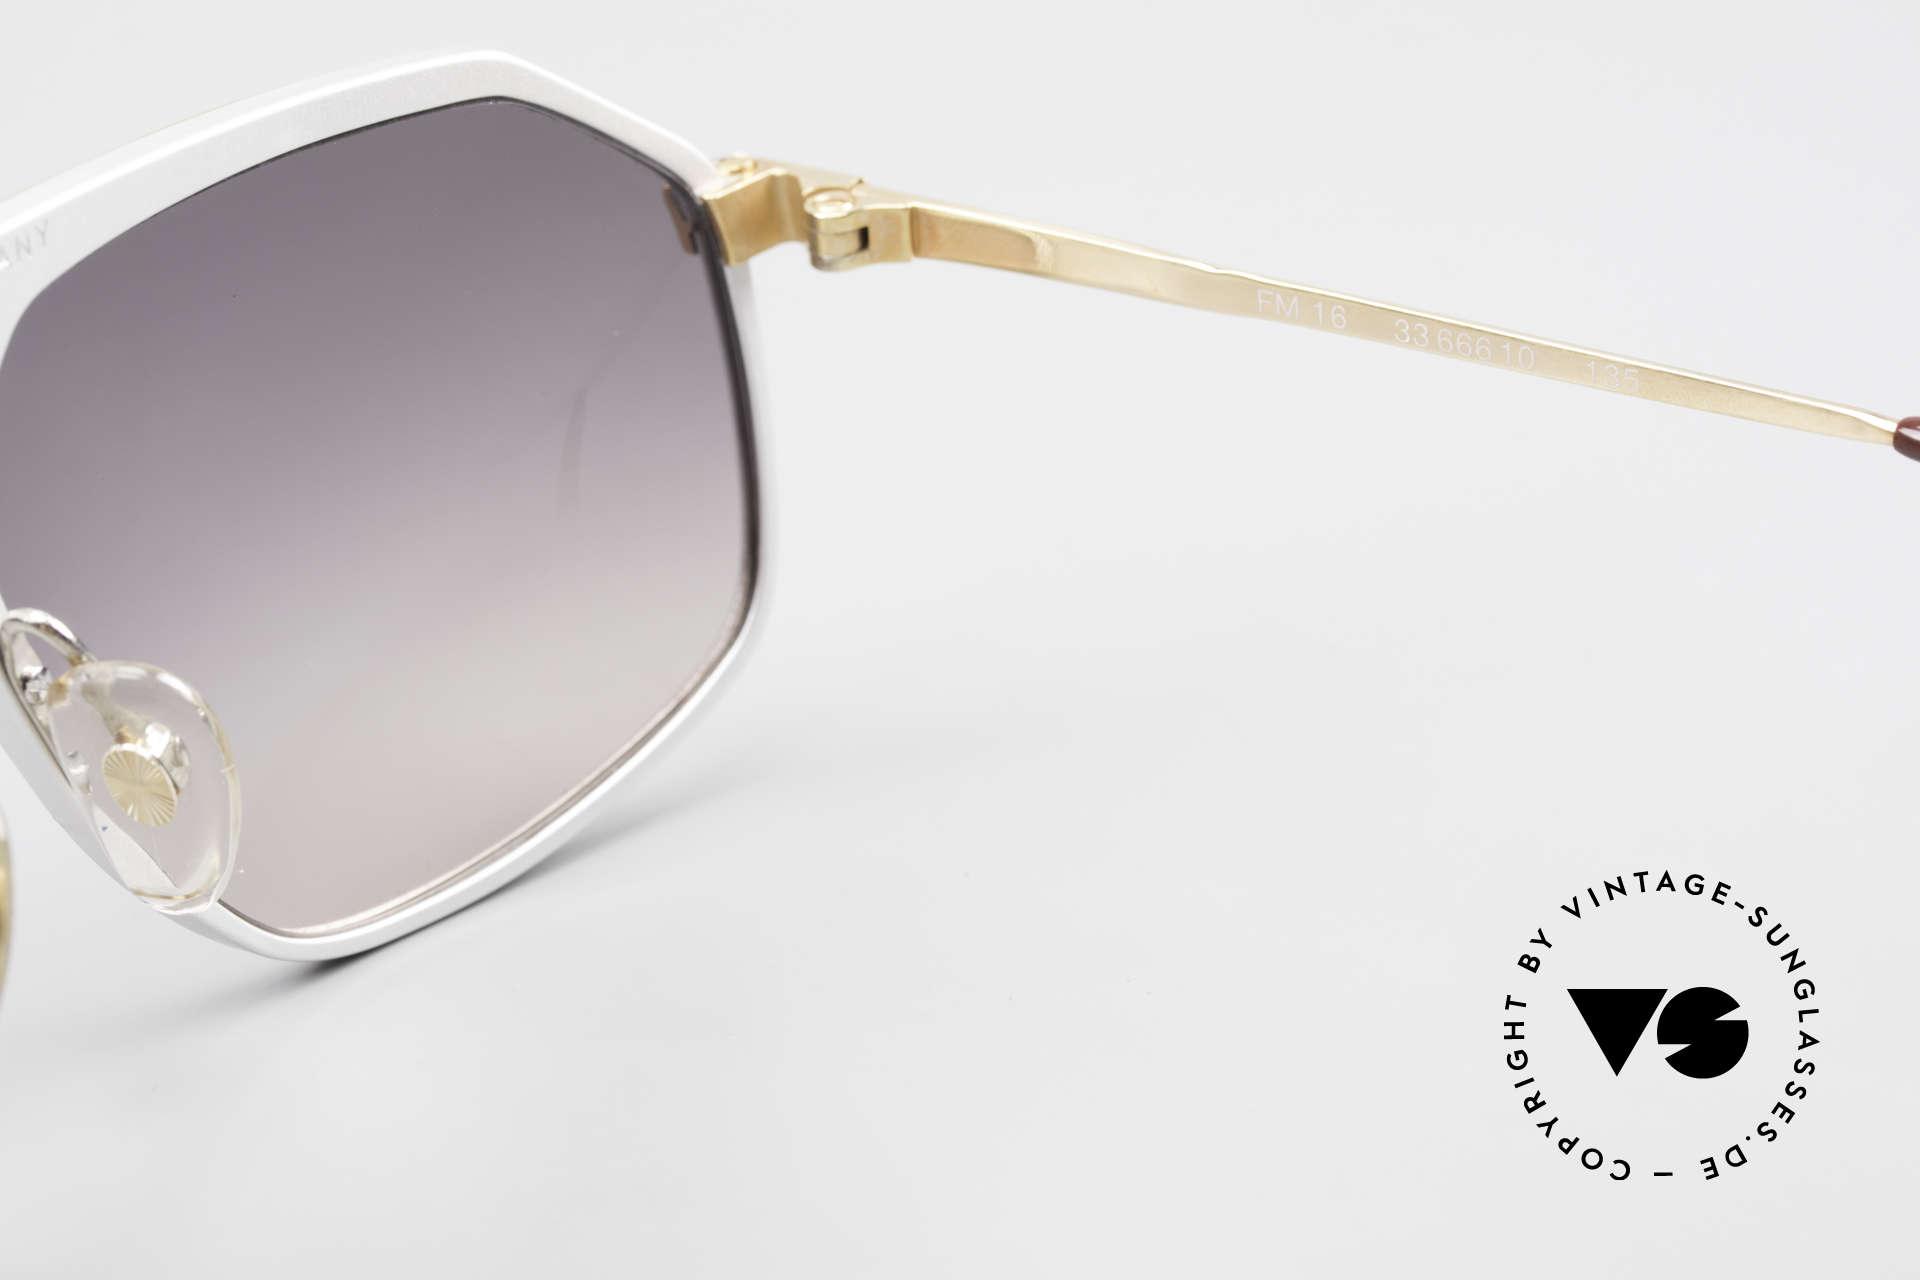 Alpina M6 Vintage Glasses Par Excellence, Size: medium, Made for Men and Women